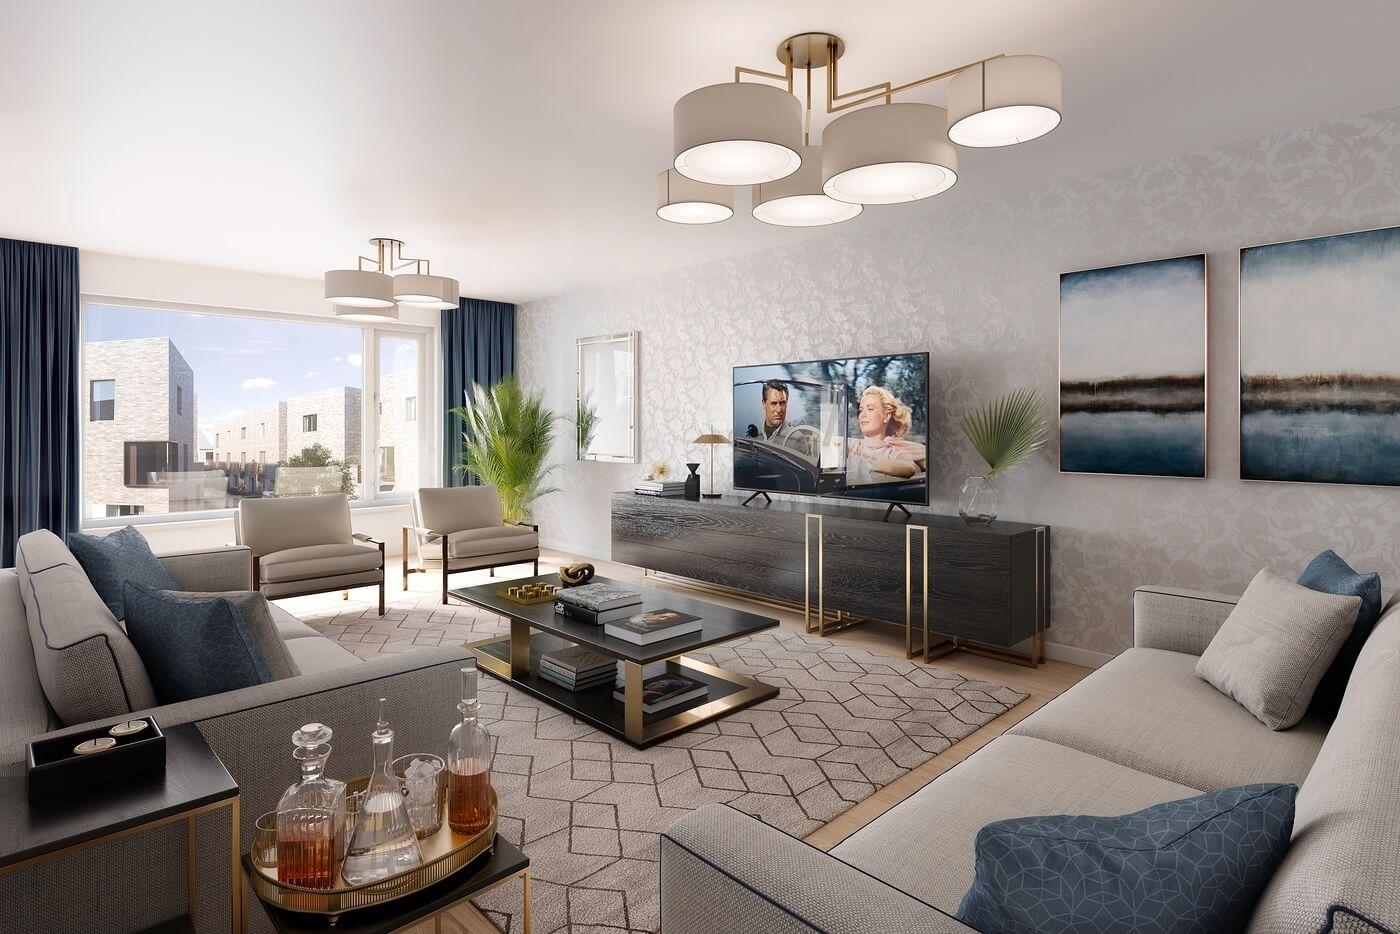 Living Room image of a Villa